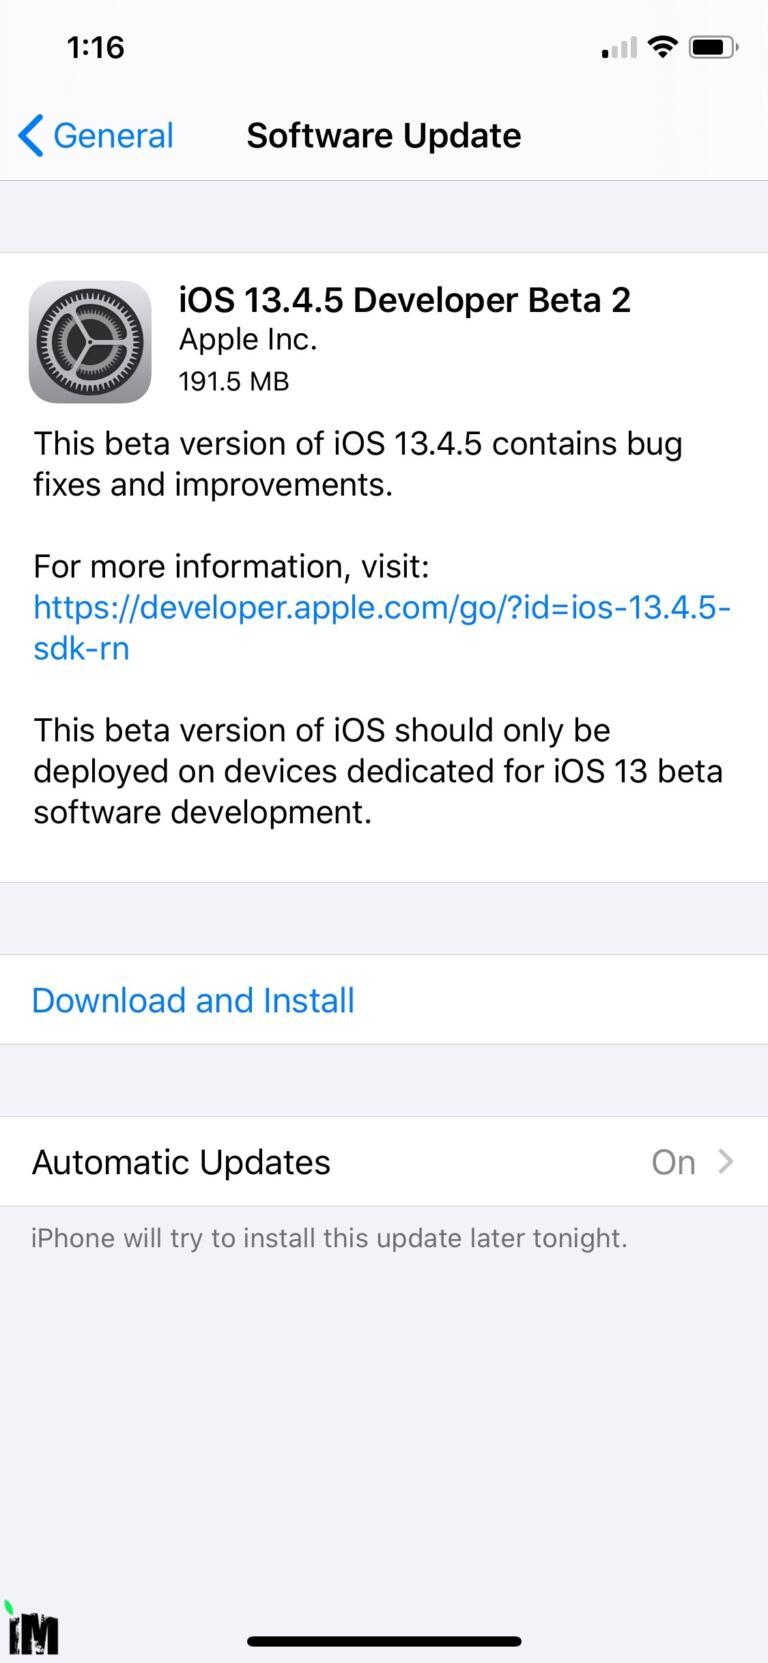 Apple Releases iOS 13.4.5 Beta 2 and iPadOS 13.4.5 Beta 2